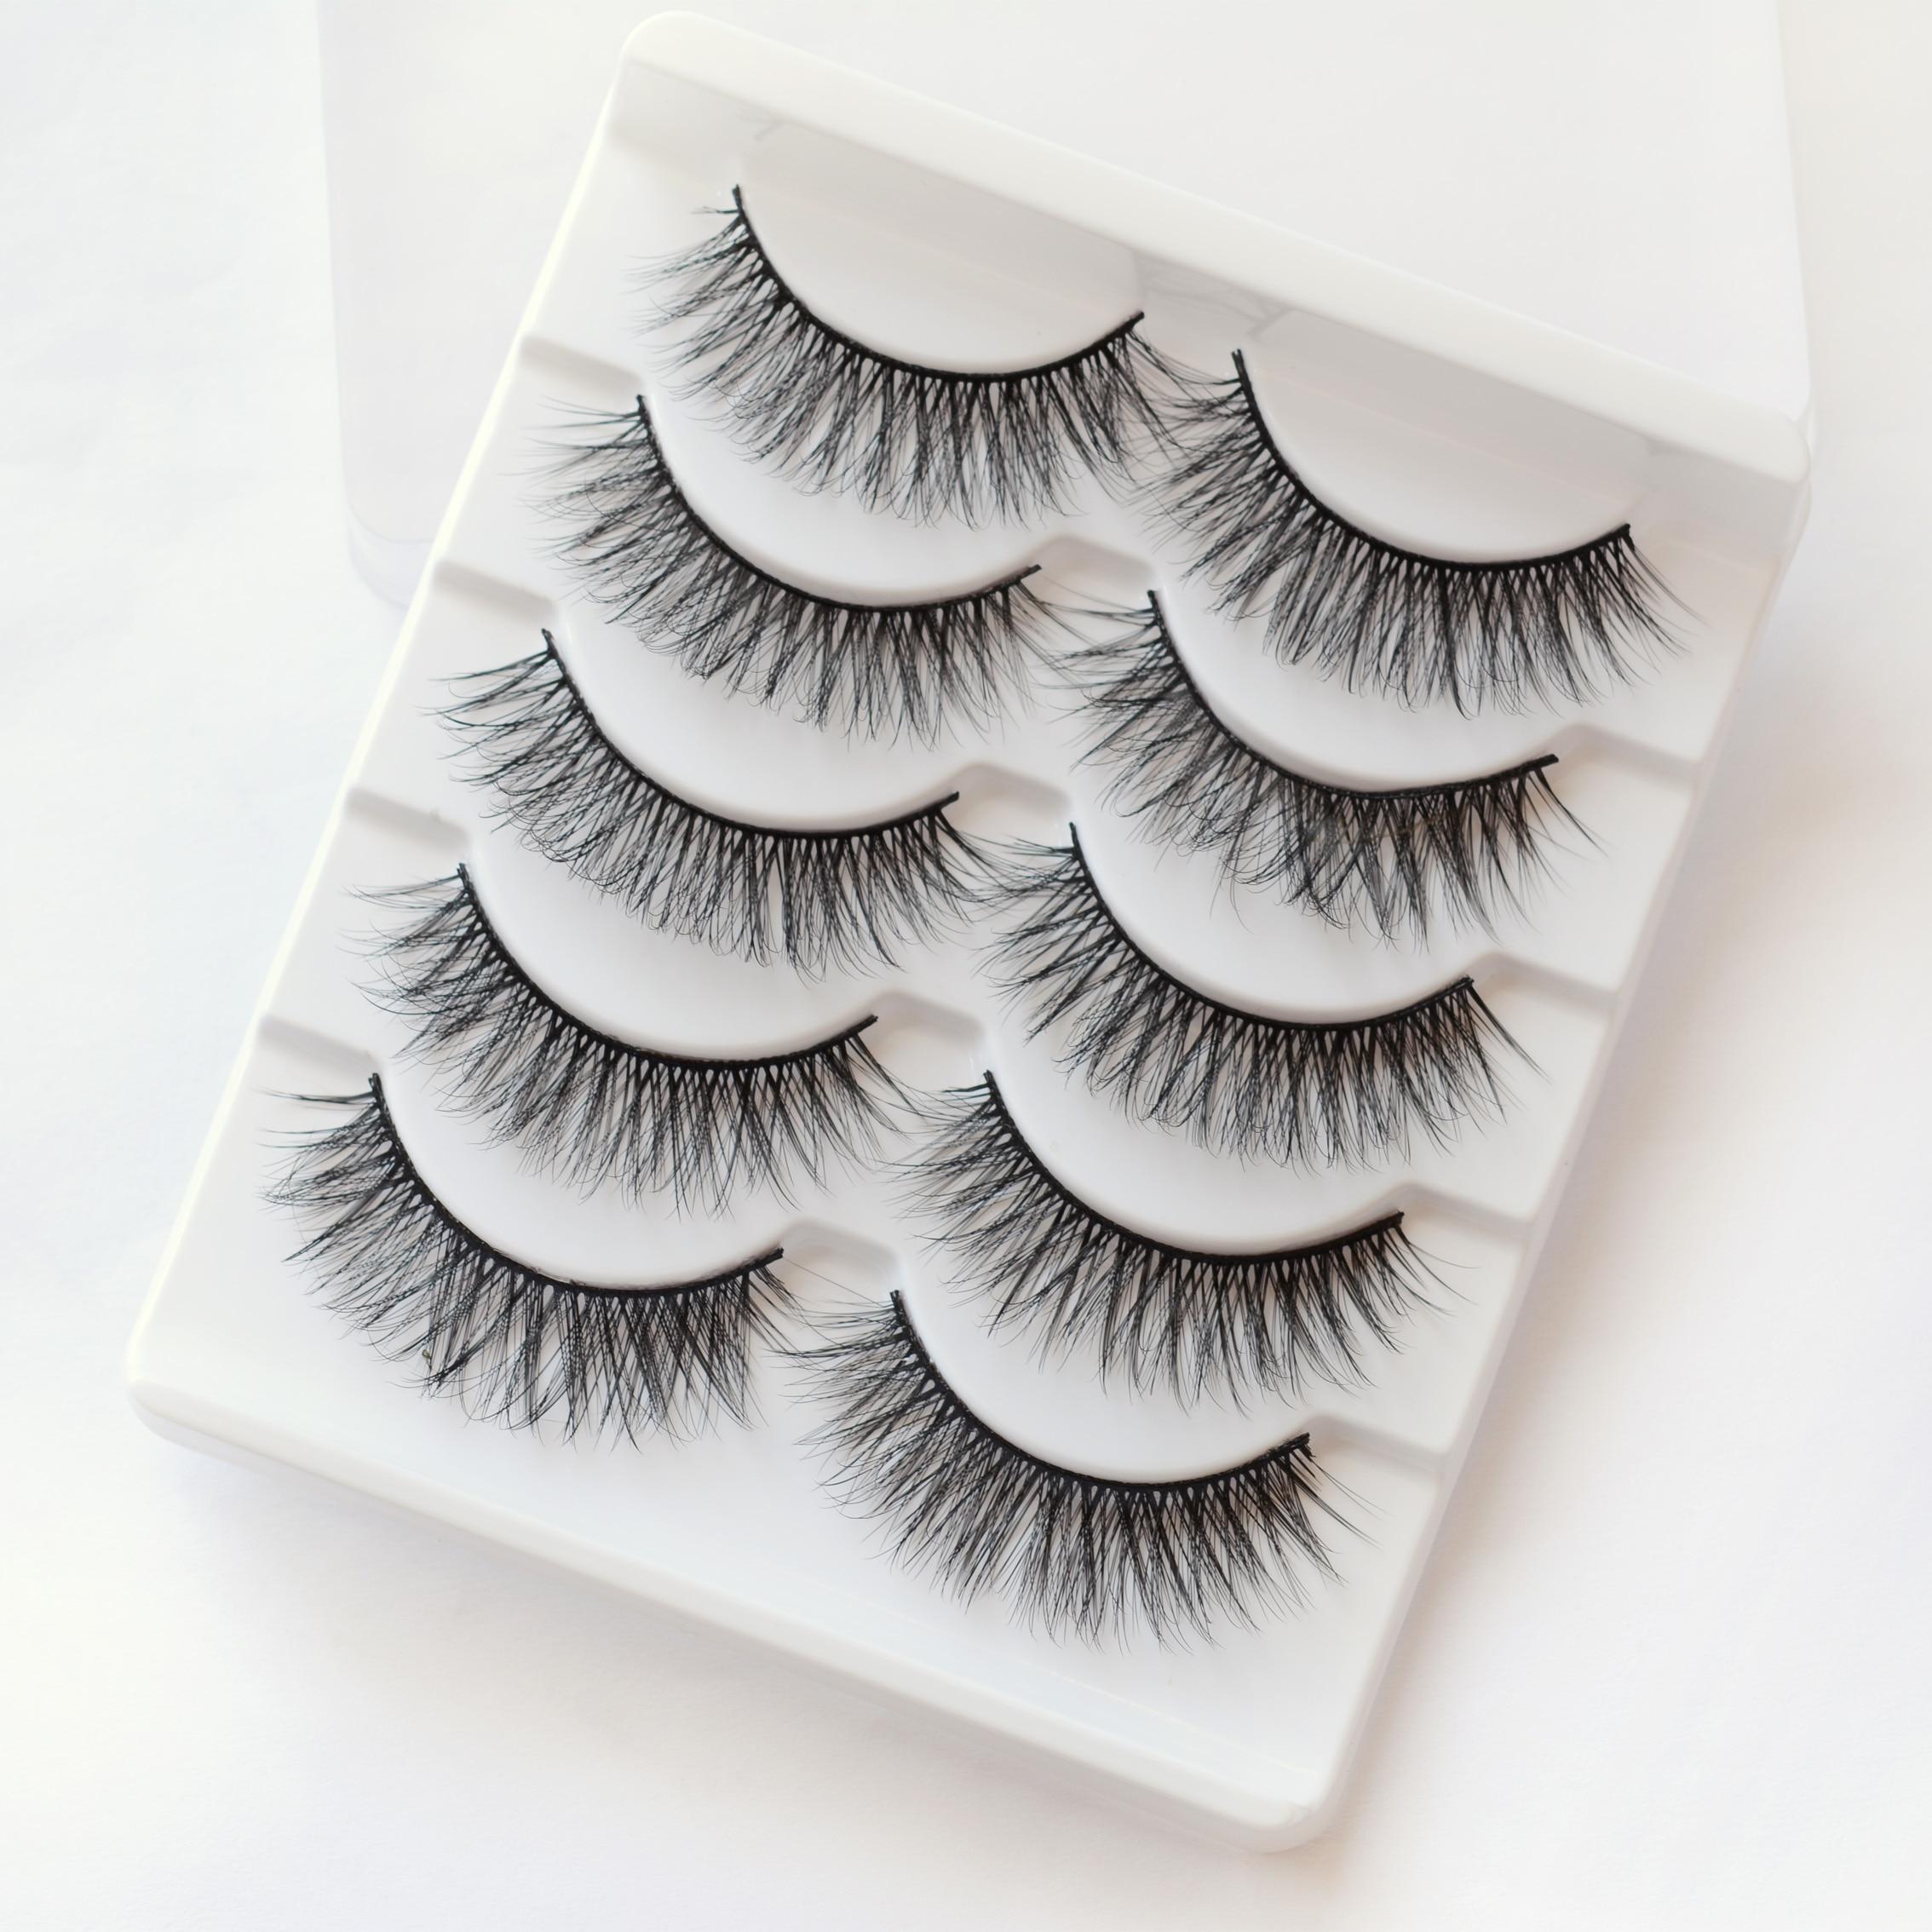 Nature Eye Makeup Tools 5 Pairs 3D False Eyelashes Faux Eye Lashes Thick Curled Eyelash Extension Fa